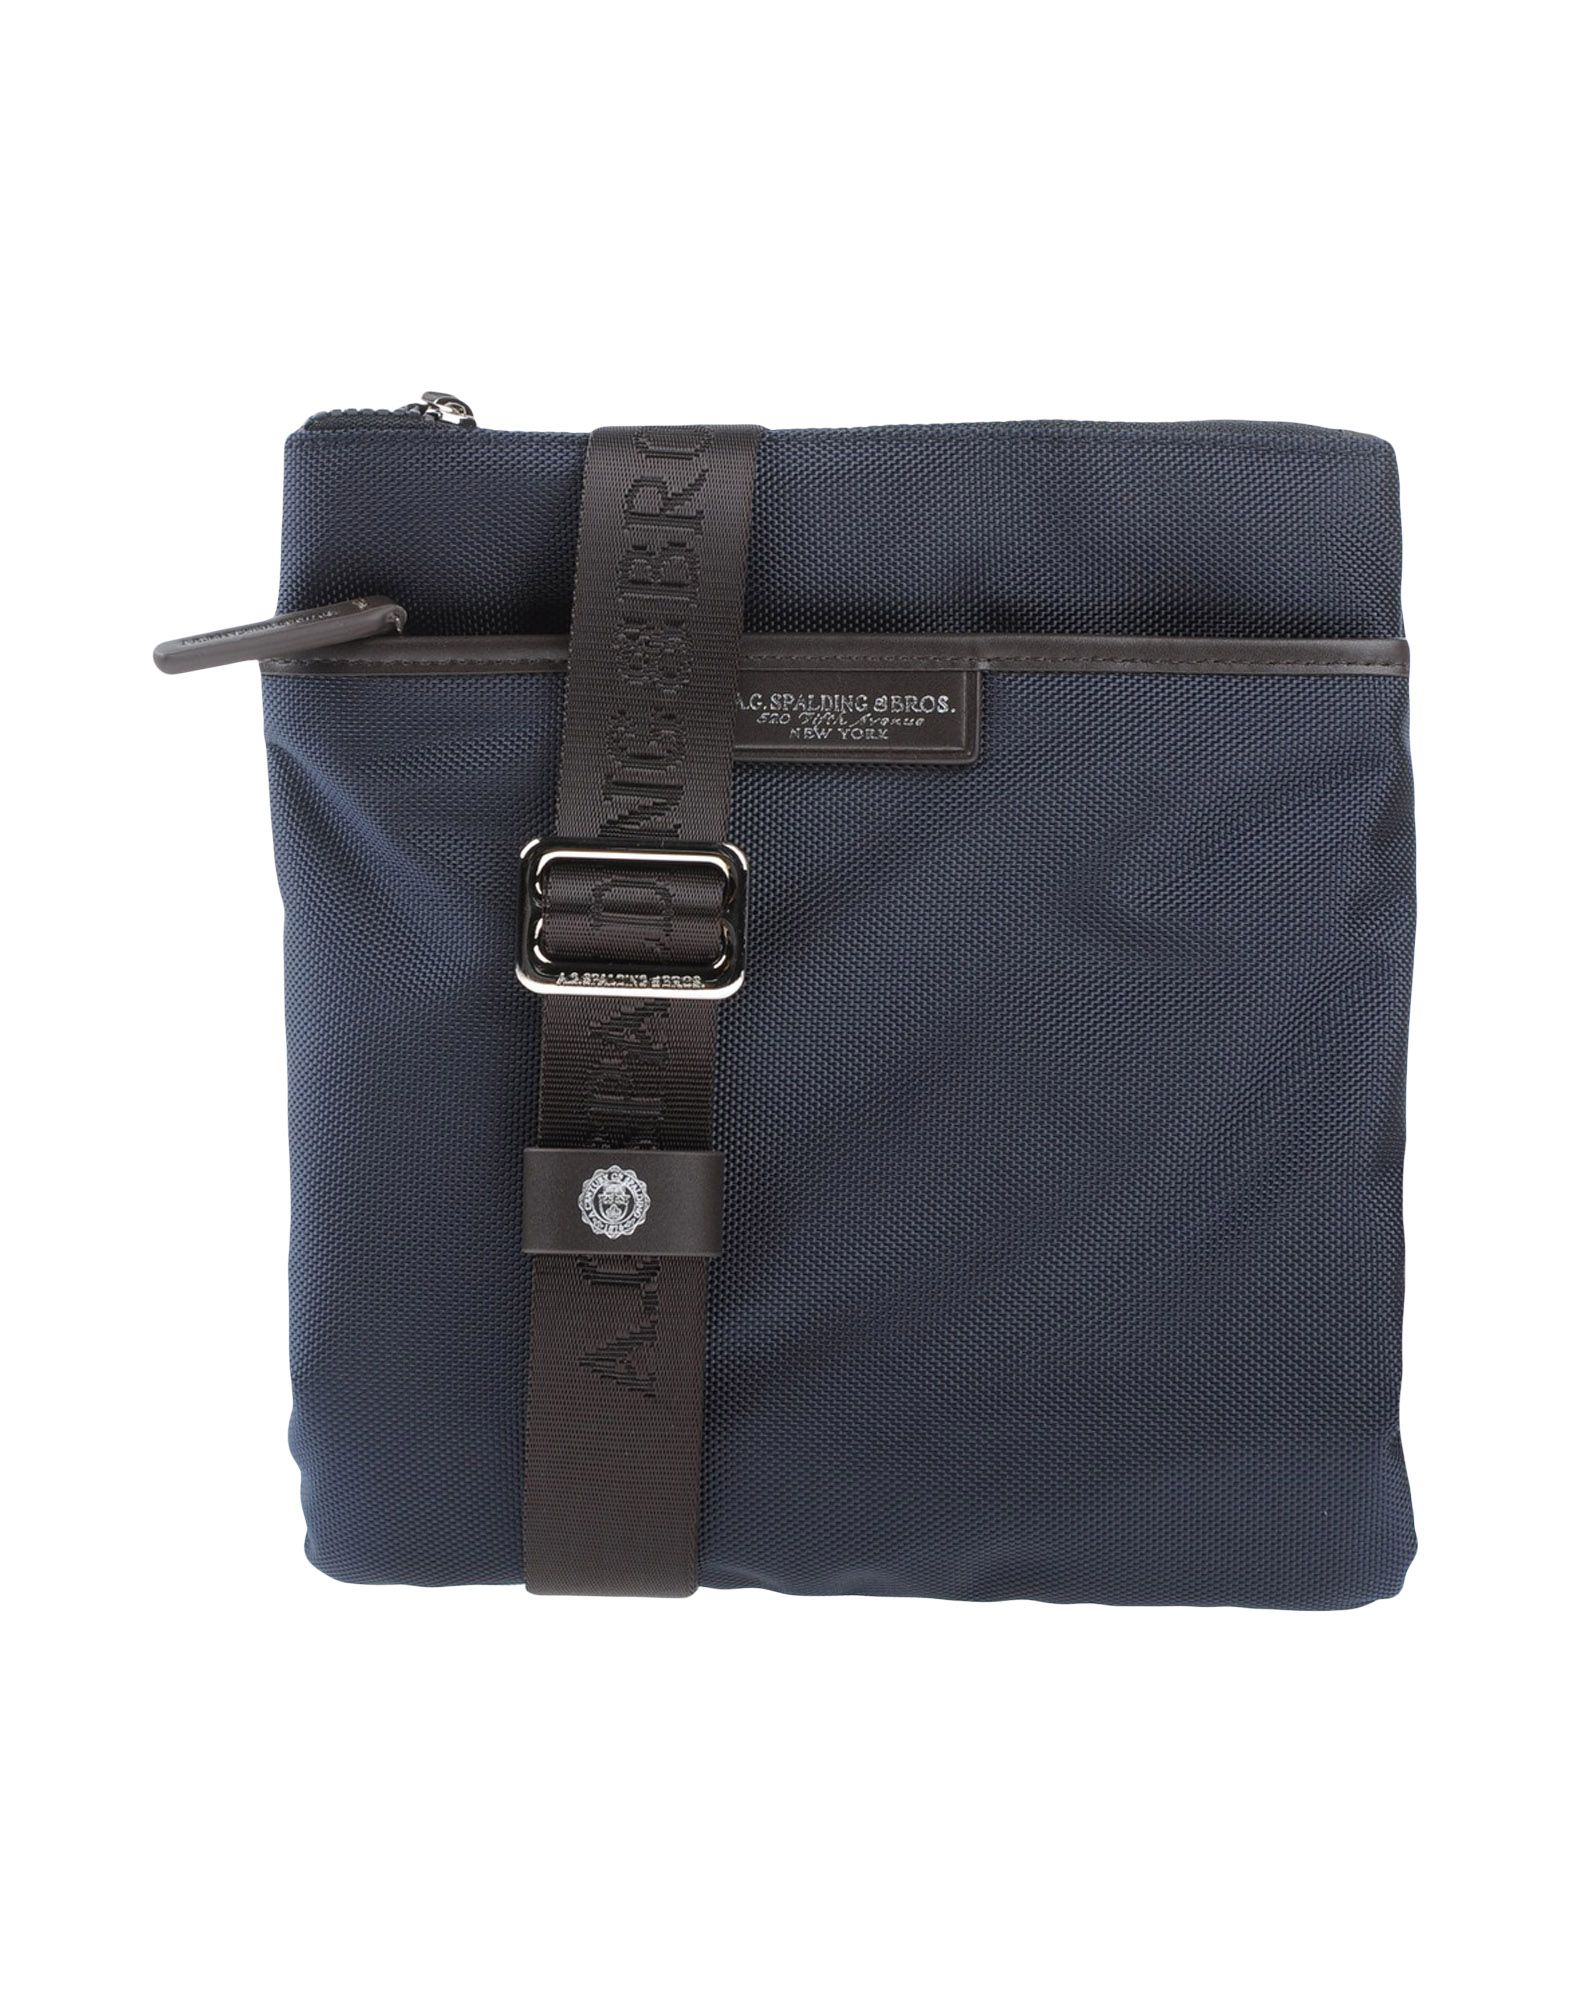 A.G. SPALDING & BROS. 520 FIFTH AVENUE  New York Сумка через плечо kate spade new york сумка через плечо